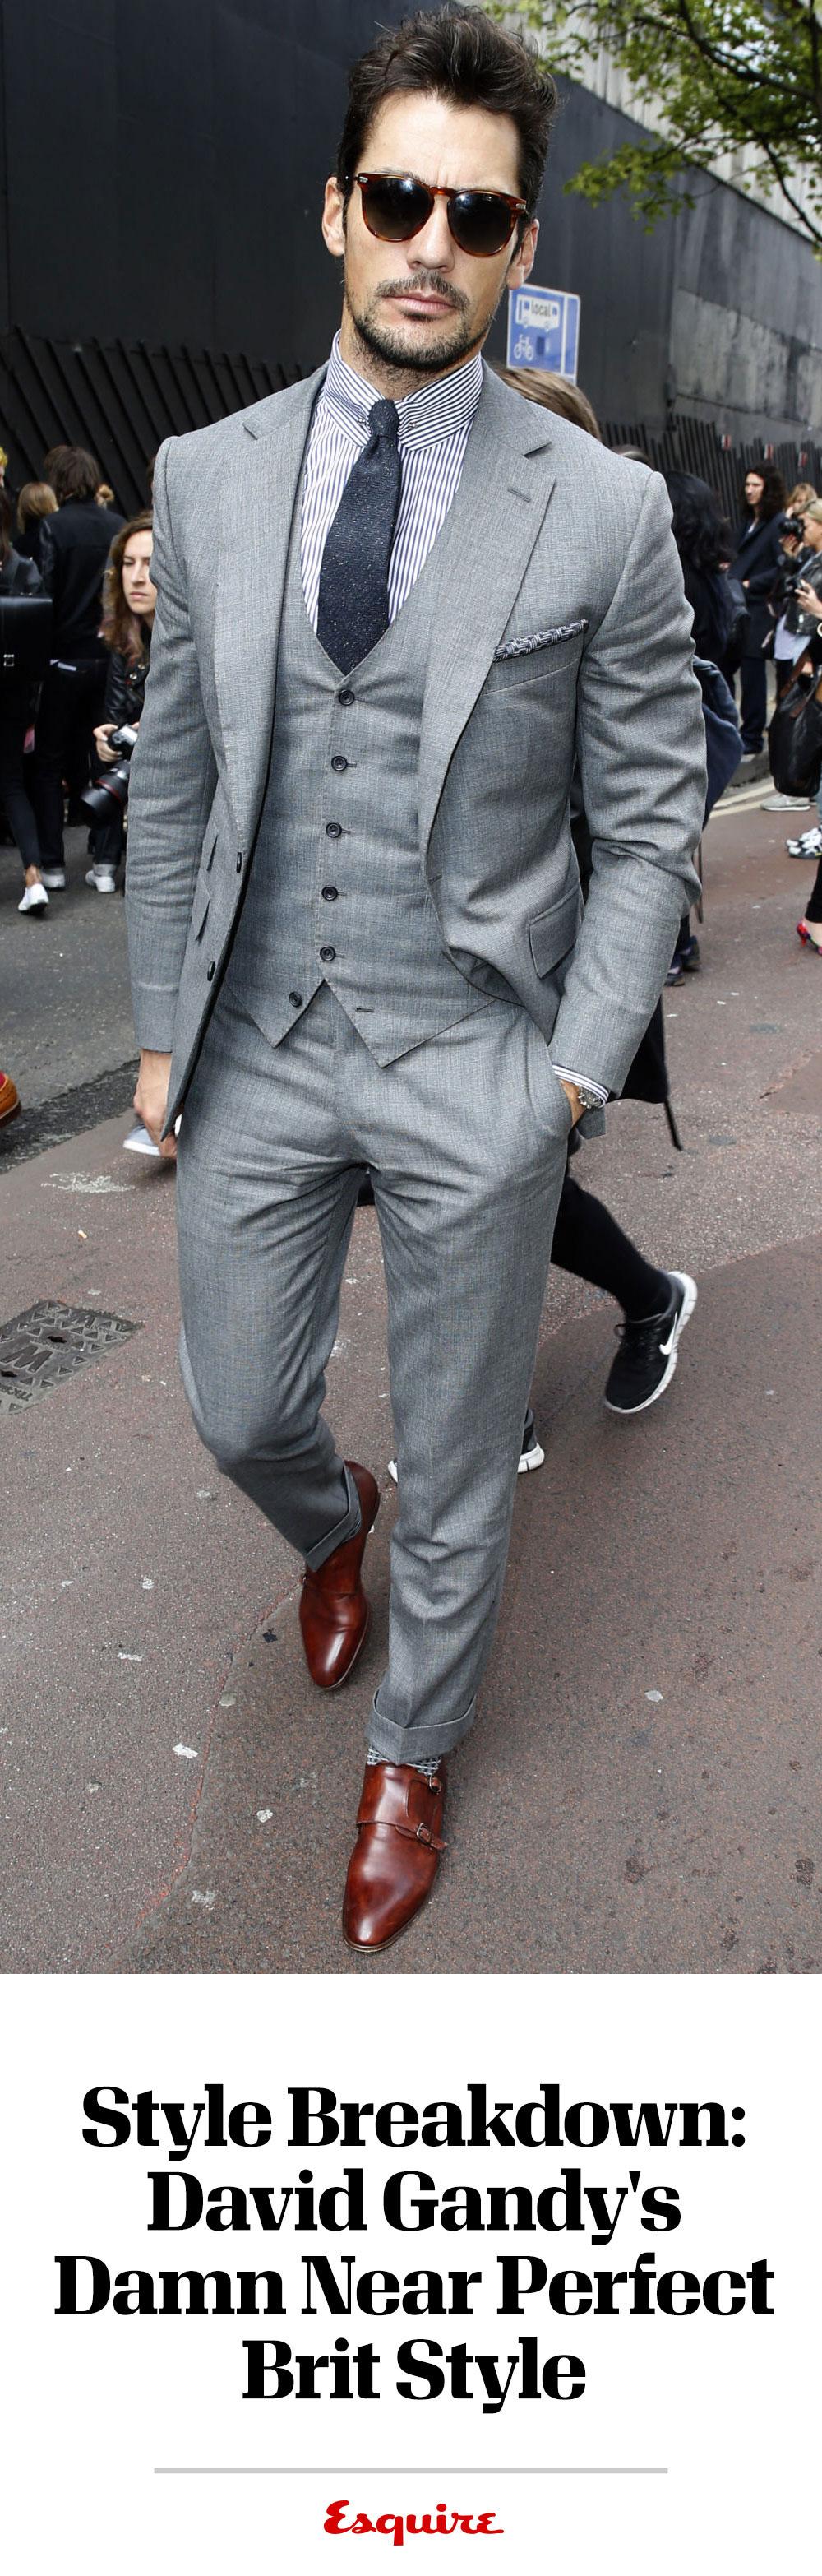 Style Breakdown: David Gandy's Damn Near Perfect Brit ...